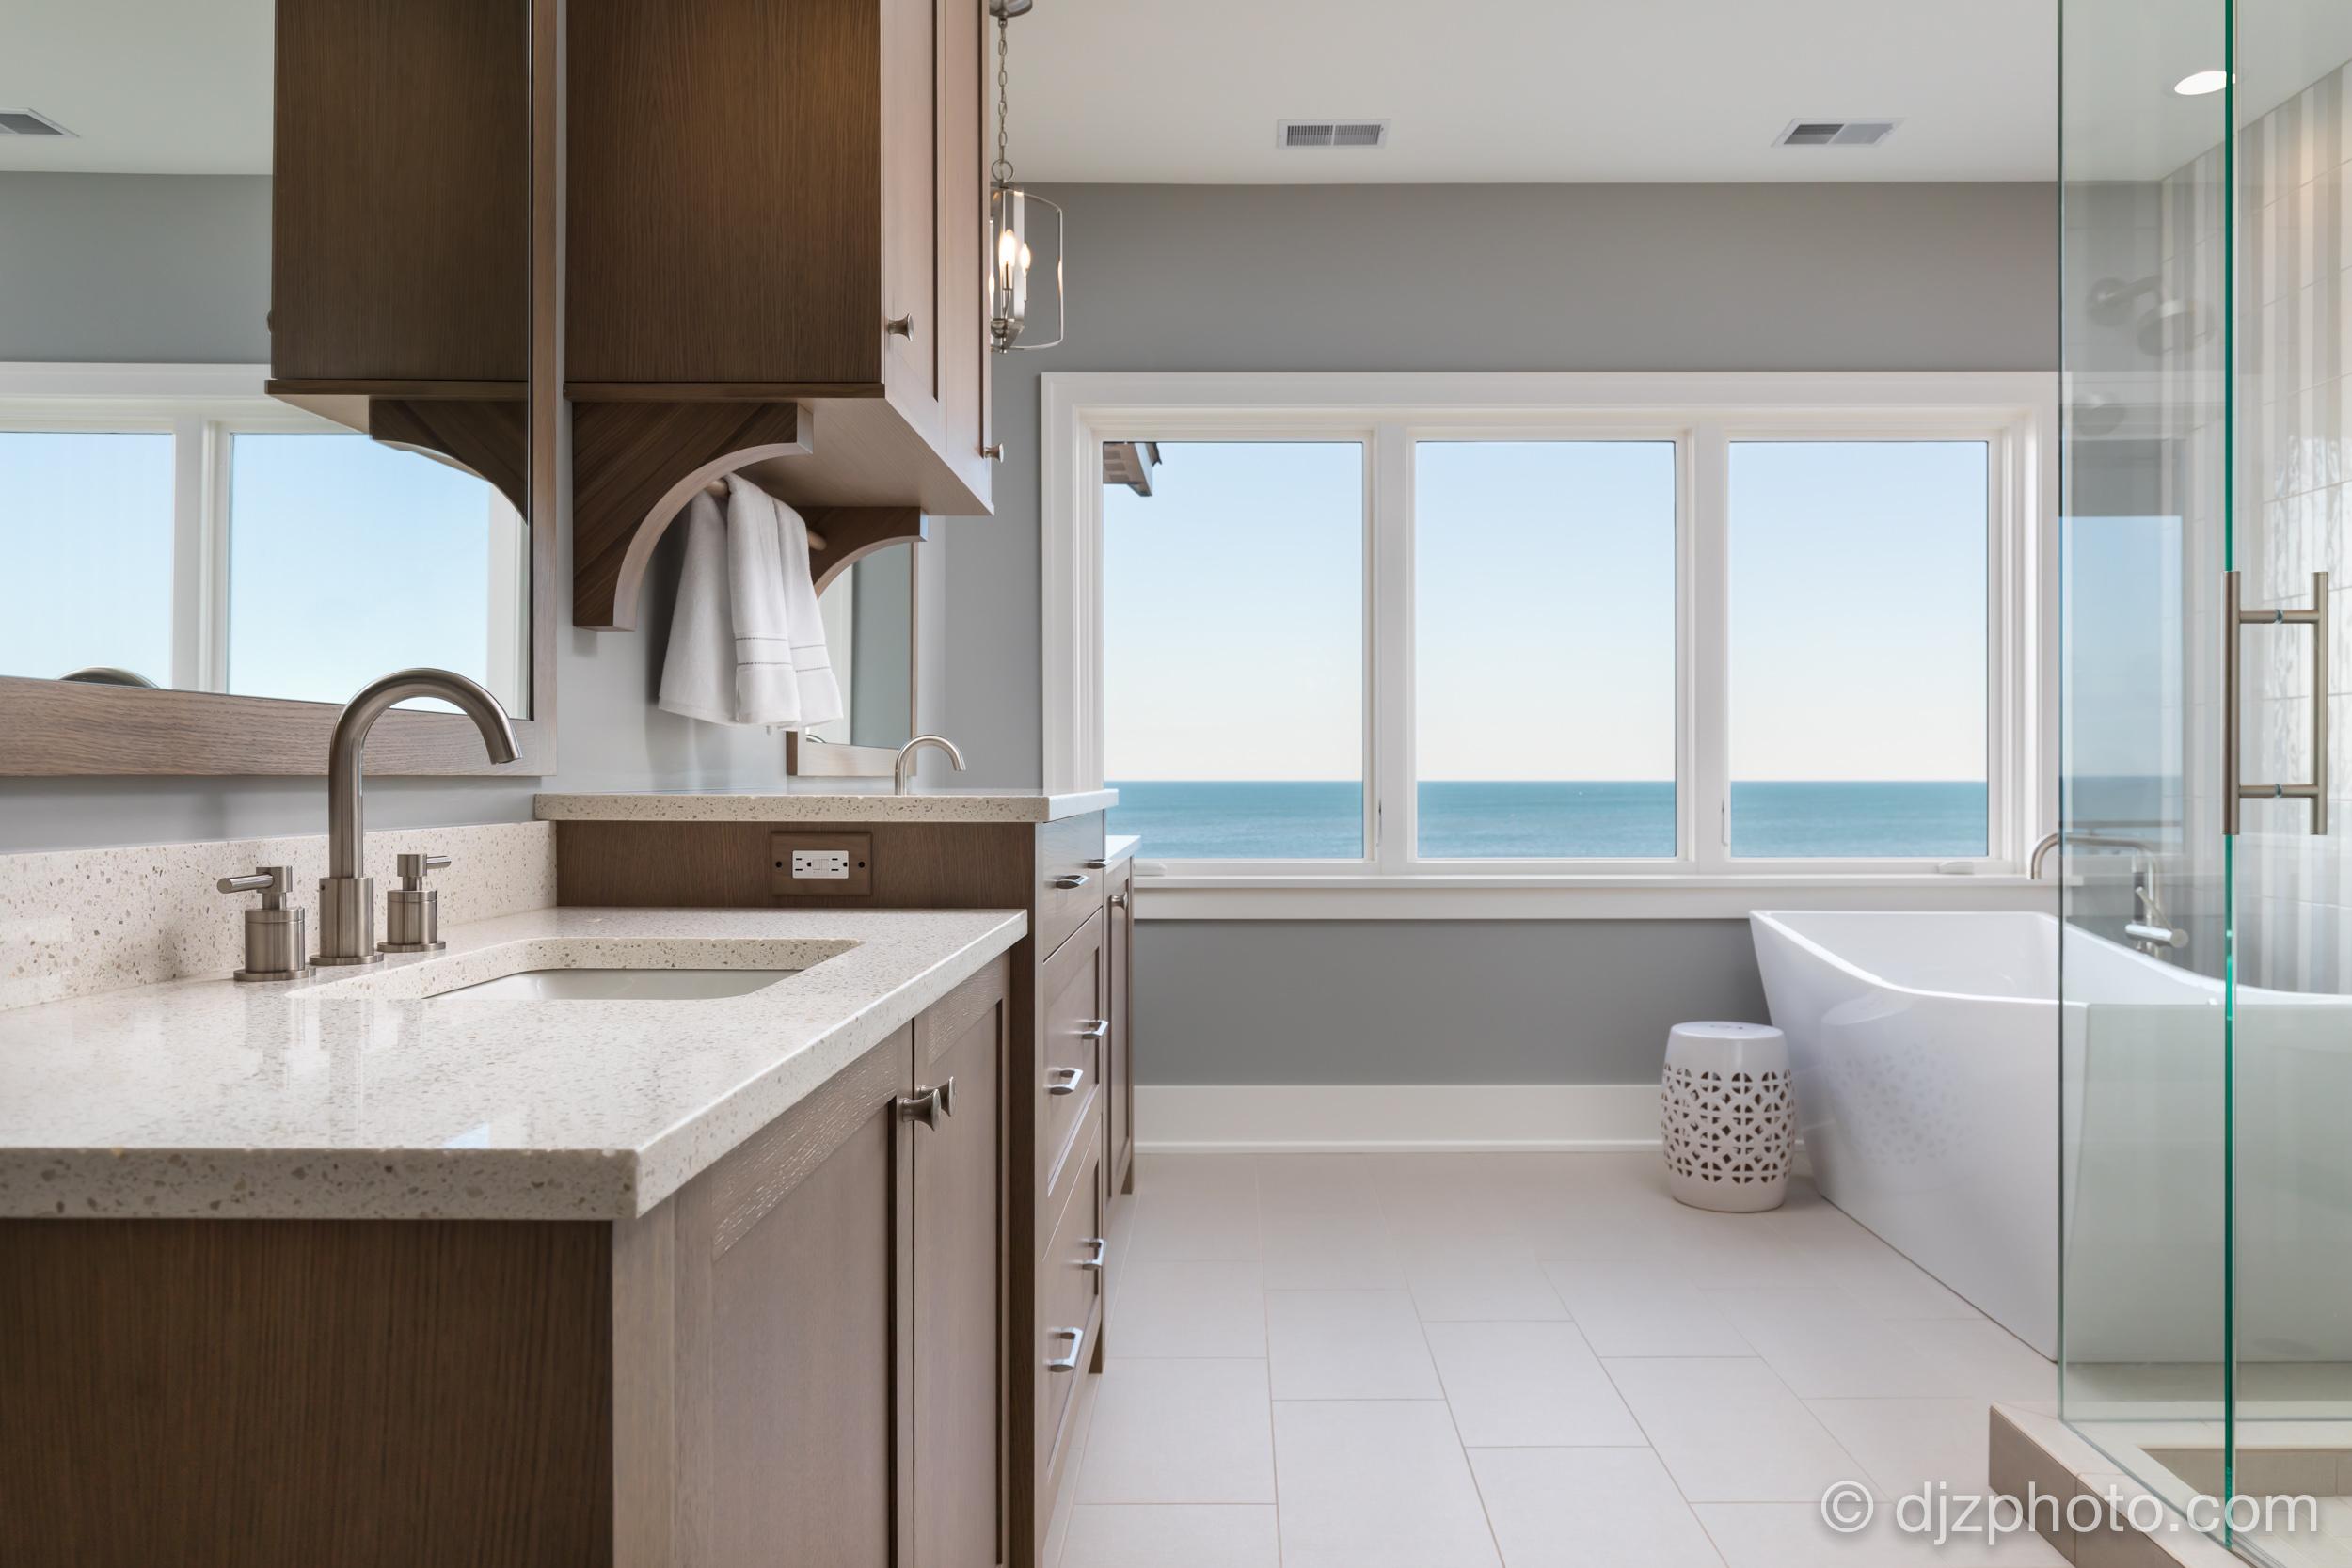 Master Bathroom by Lake Michigan